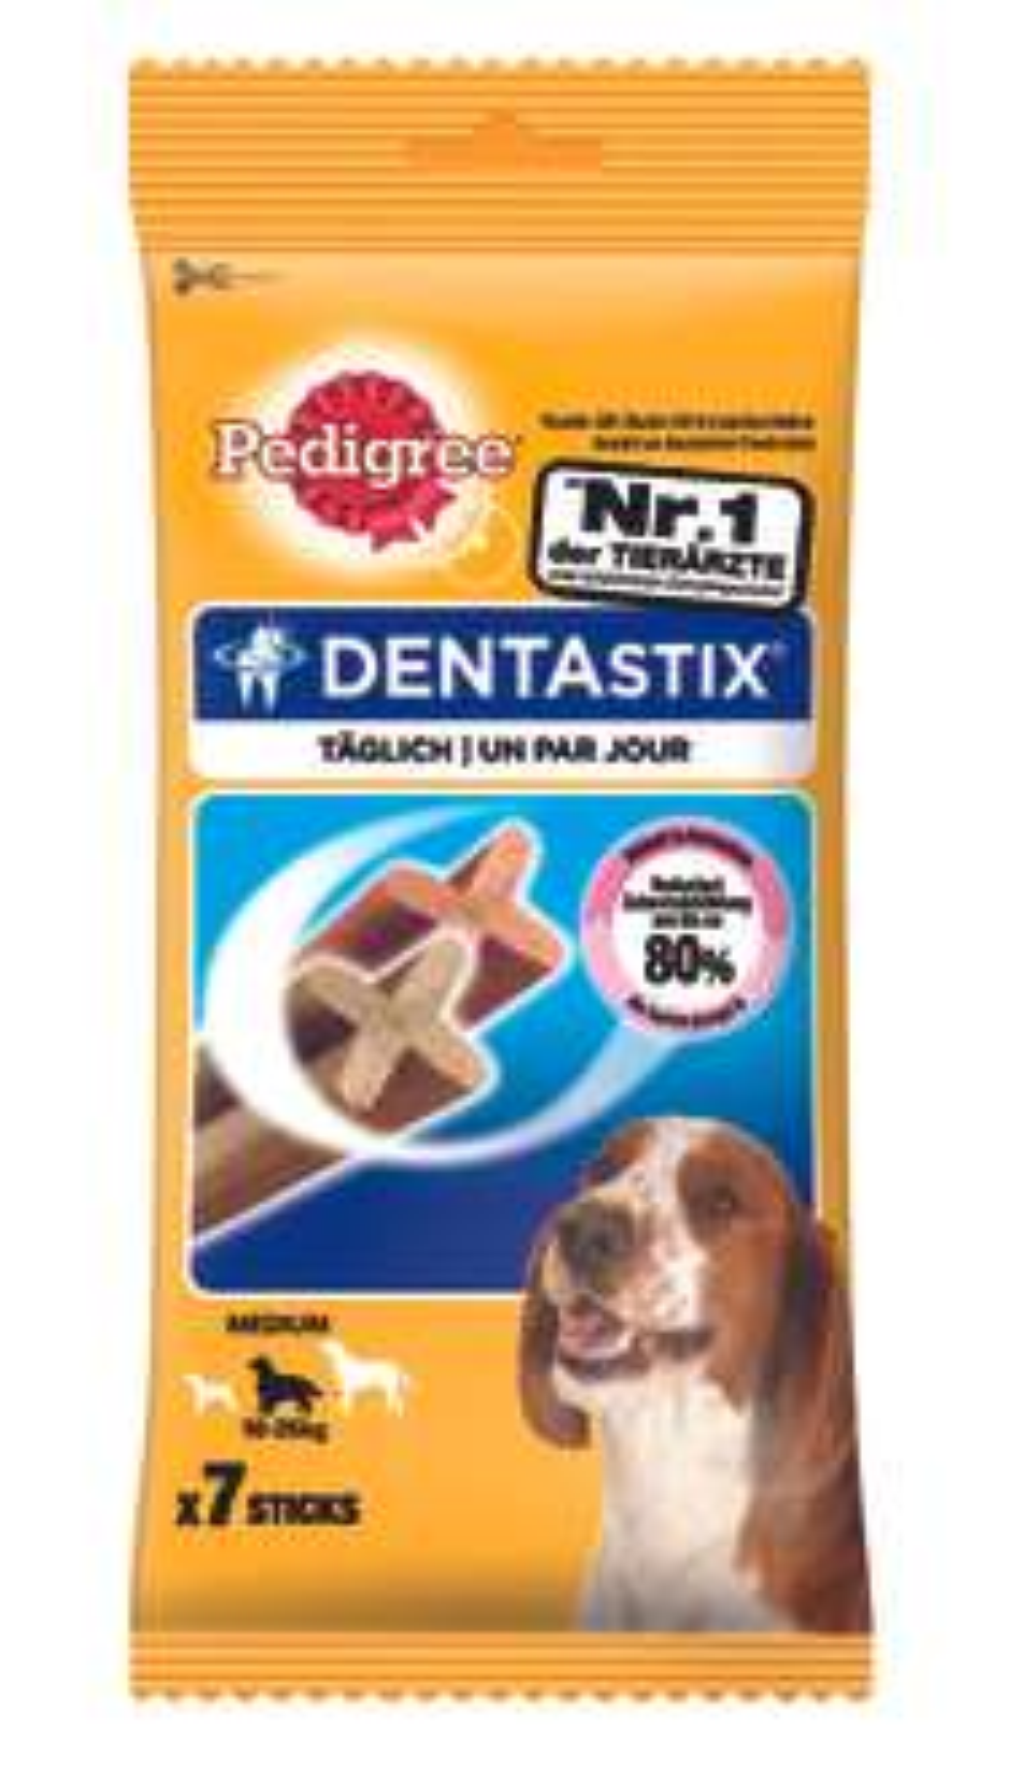 Pedigree Dentastix für mittlere Hunde 7 Stück 0,44€ plus 3,95€ VVS. Ab 29€ VVS = 0€